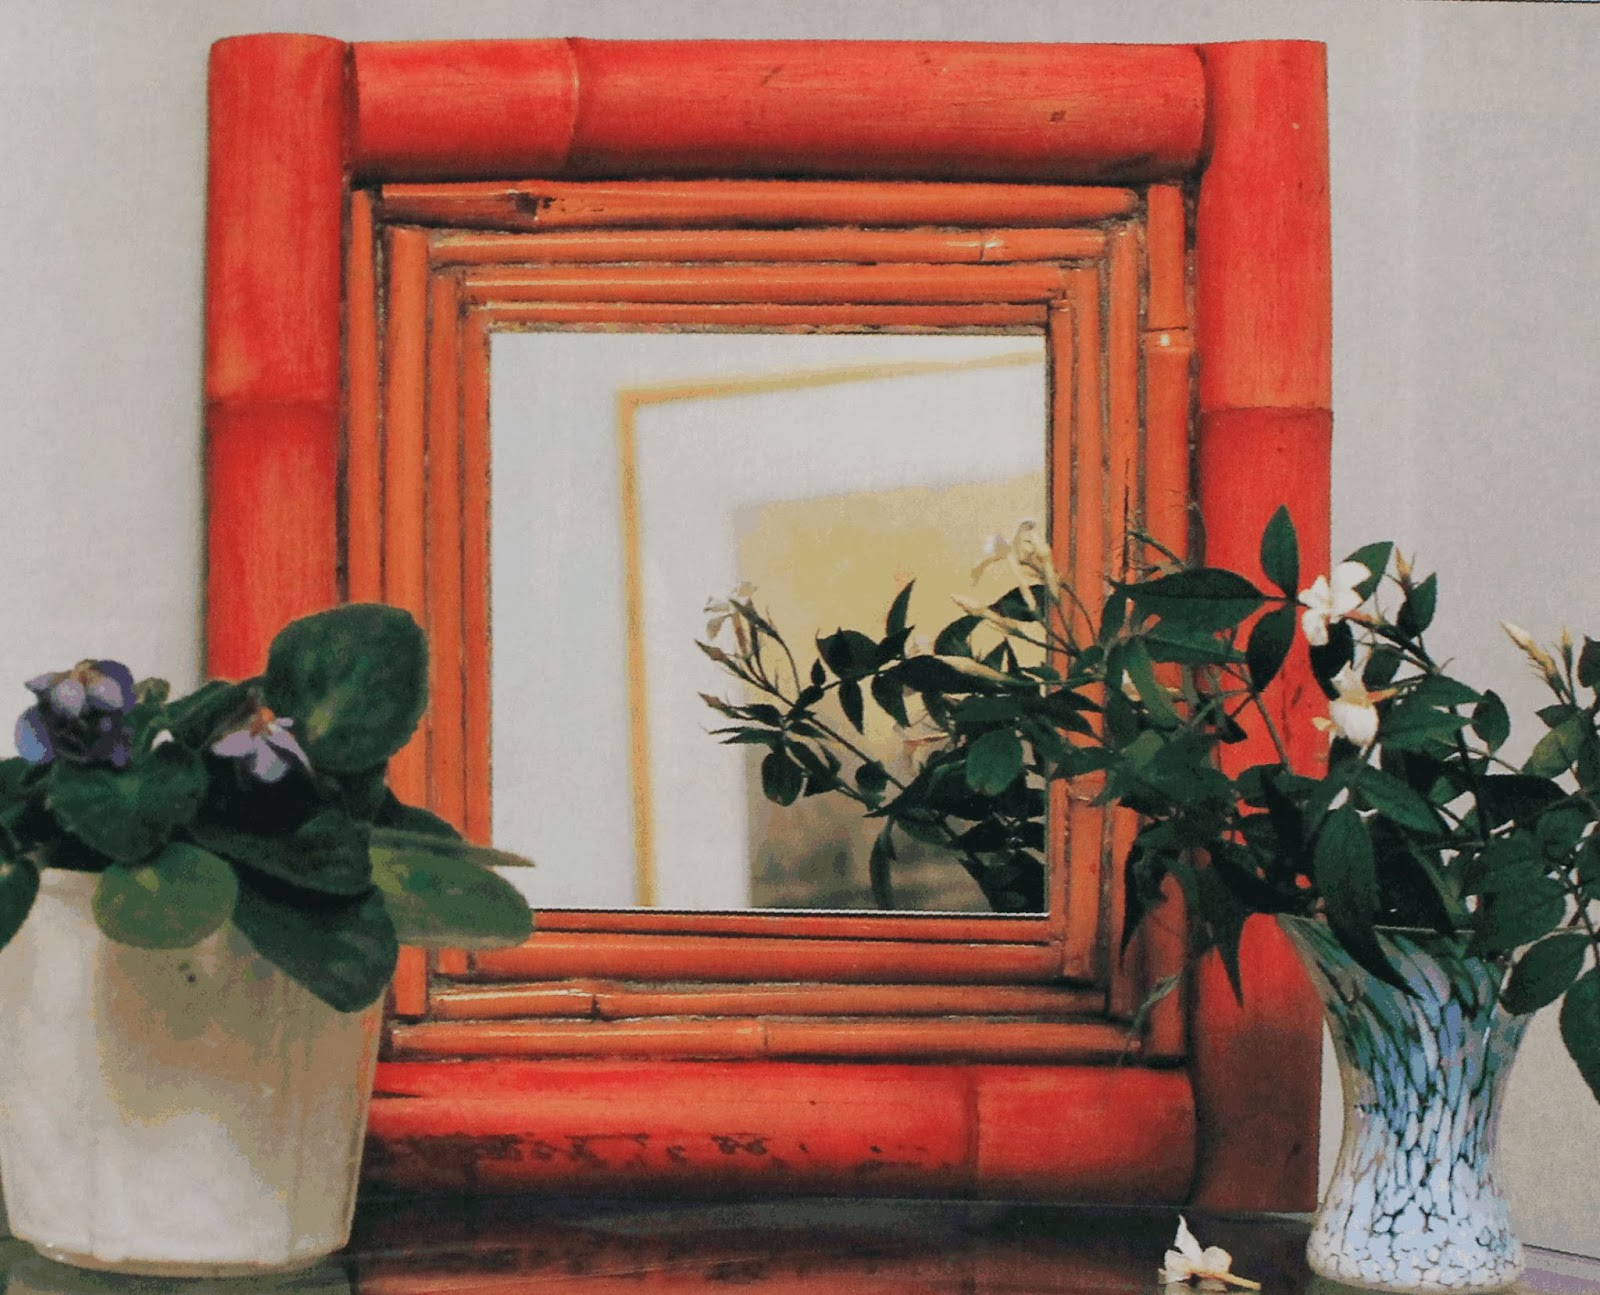 Espejo con marco de bambu paso a paso for Decoracion de espejos paso a paso